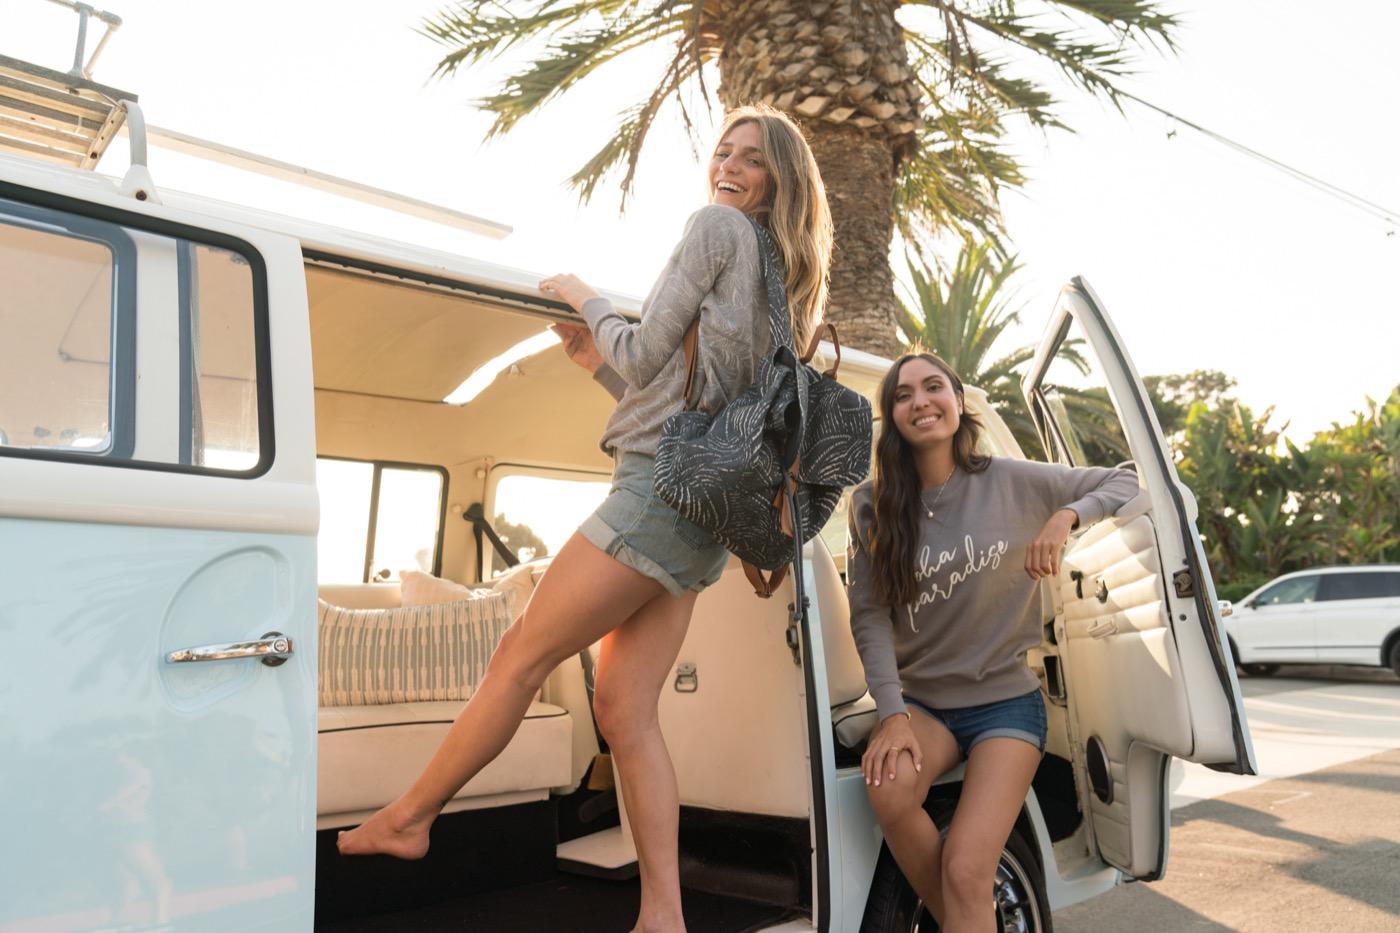 Beachly brand models on a van